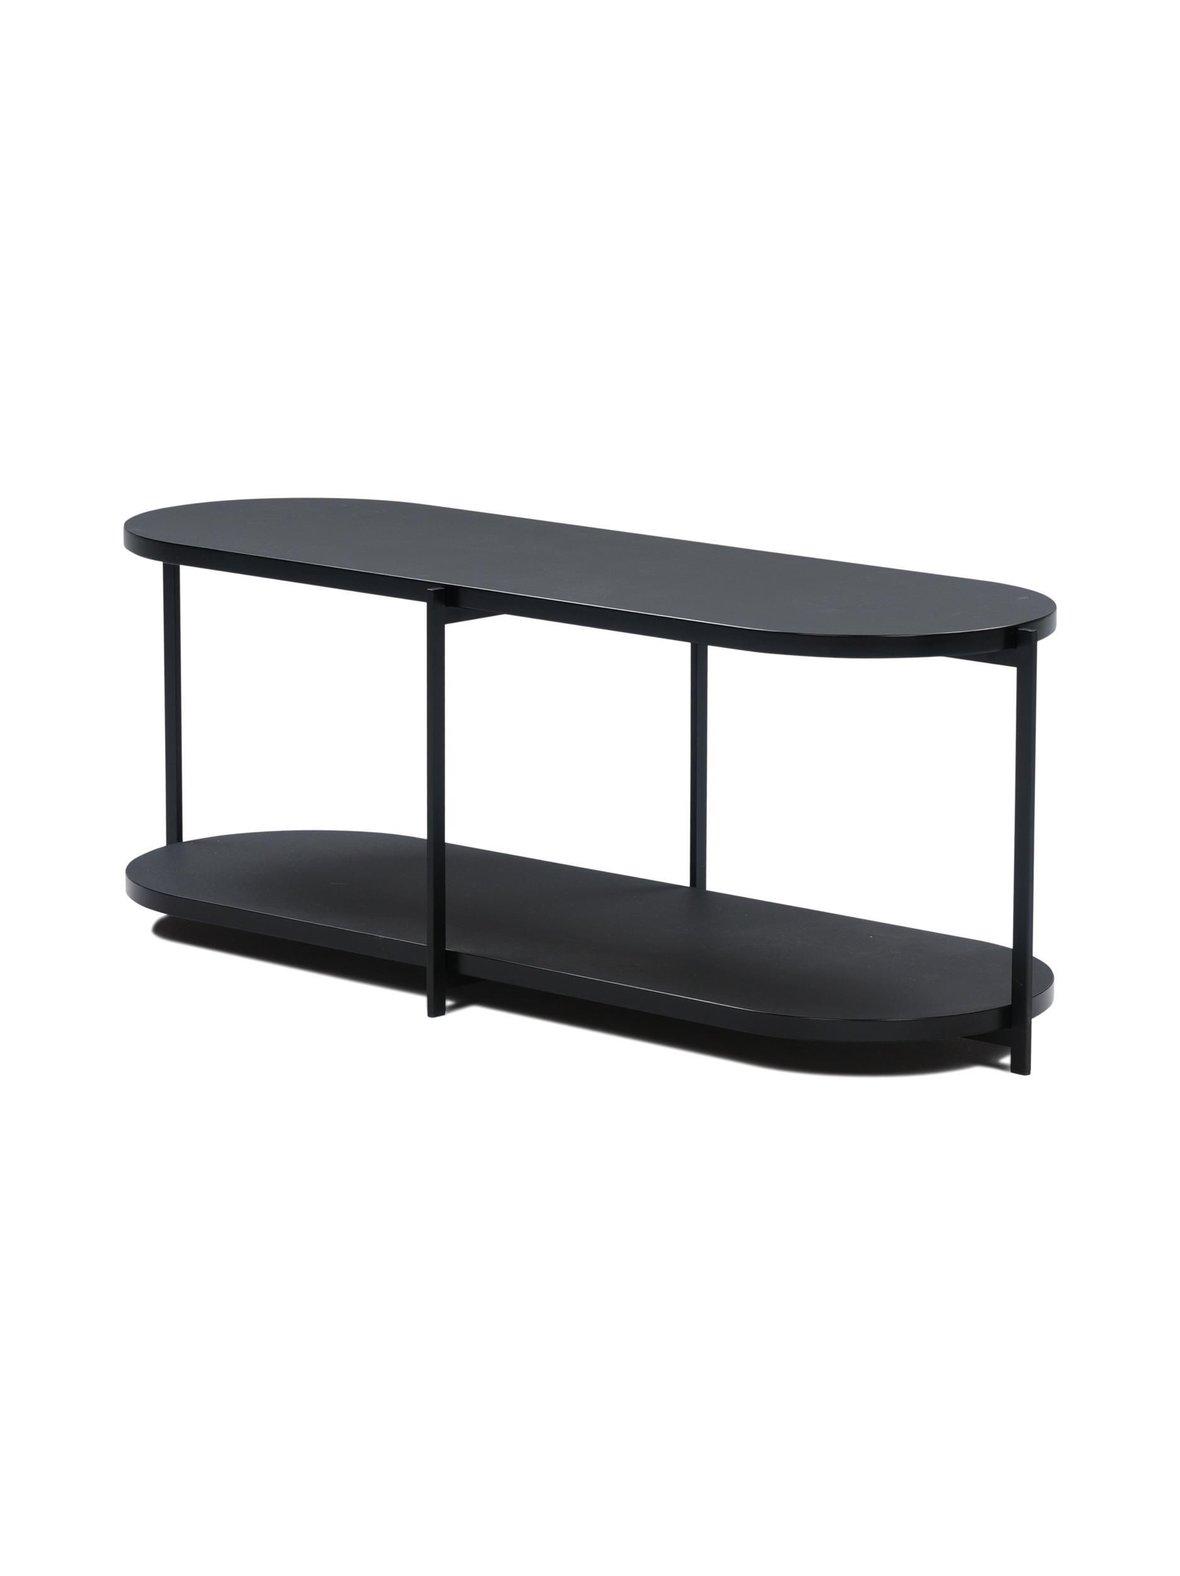 Pilleri-pöytä 40 x 120 x 45 cm, Interface